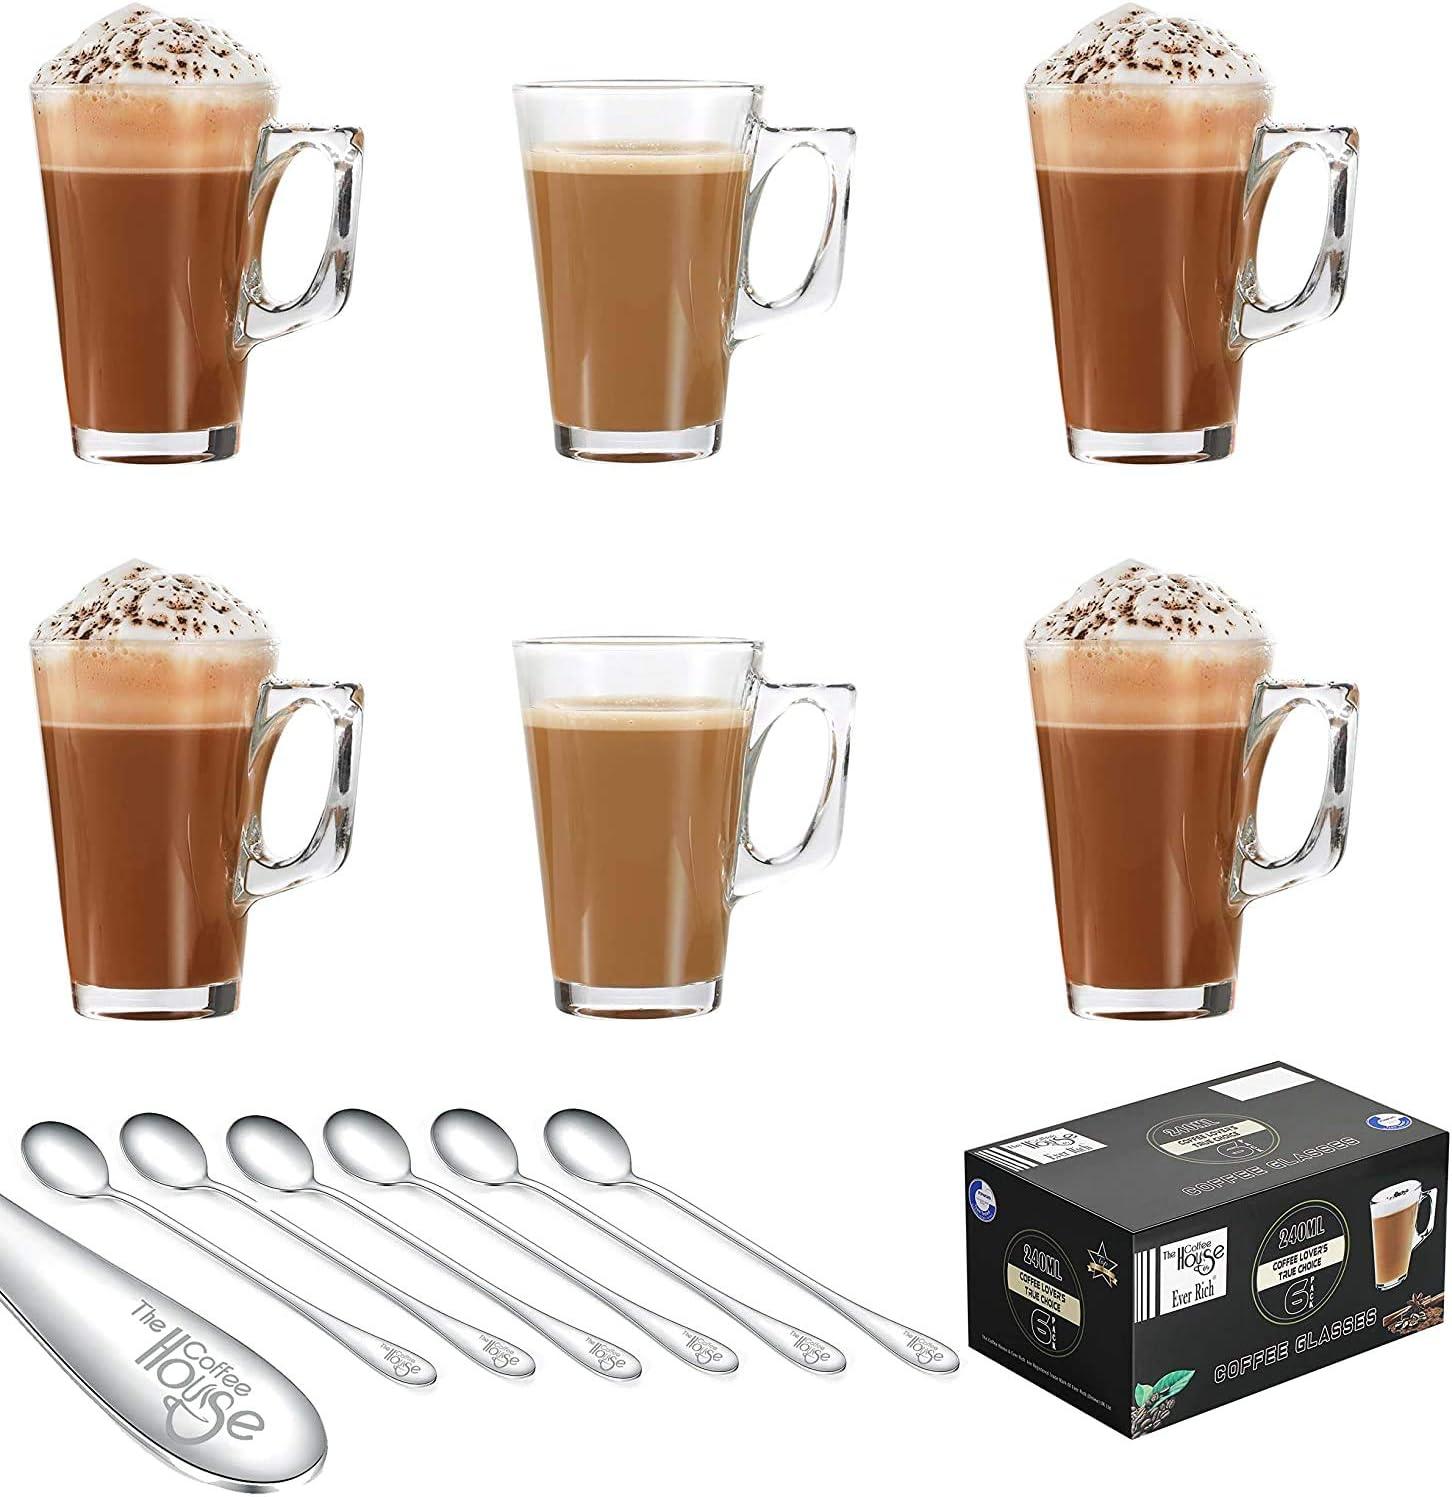 Ever Rich Tea Coffee Latte Glass Cup Mug 240ml X 6 Glasses Option 1 Amazon Co Uk Kitchen Home